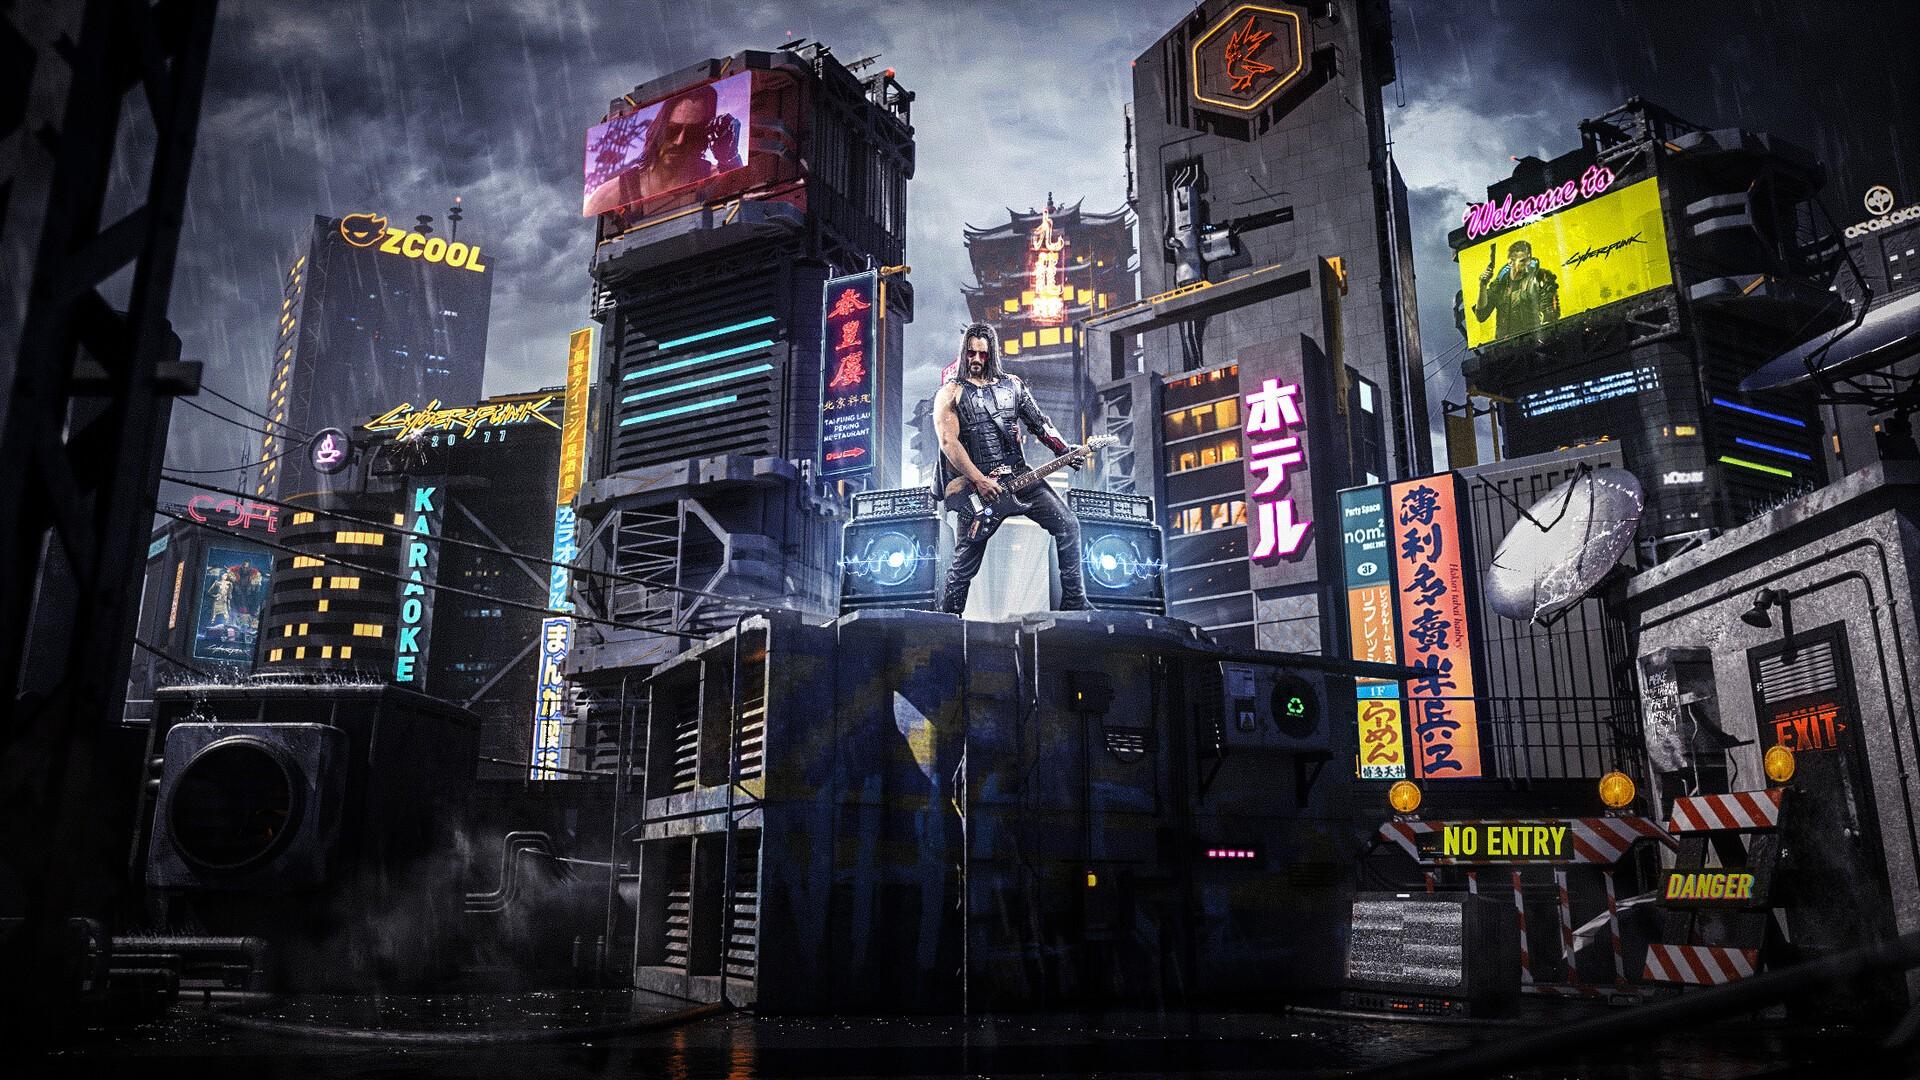 Cyberpunk 2077 Poster Pic